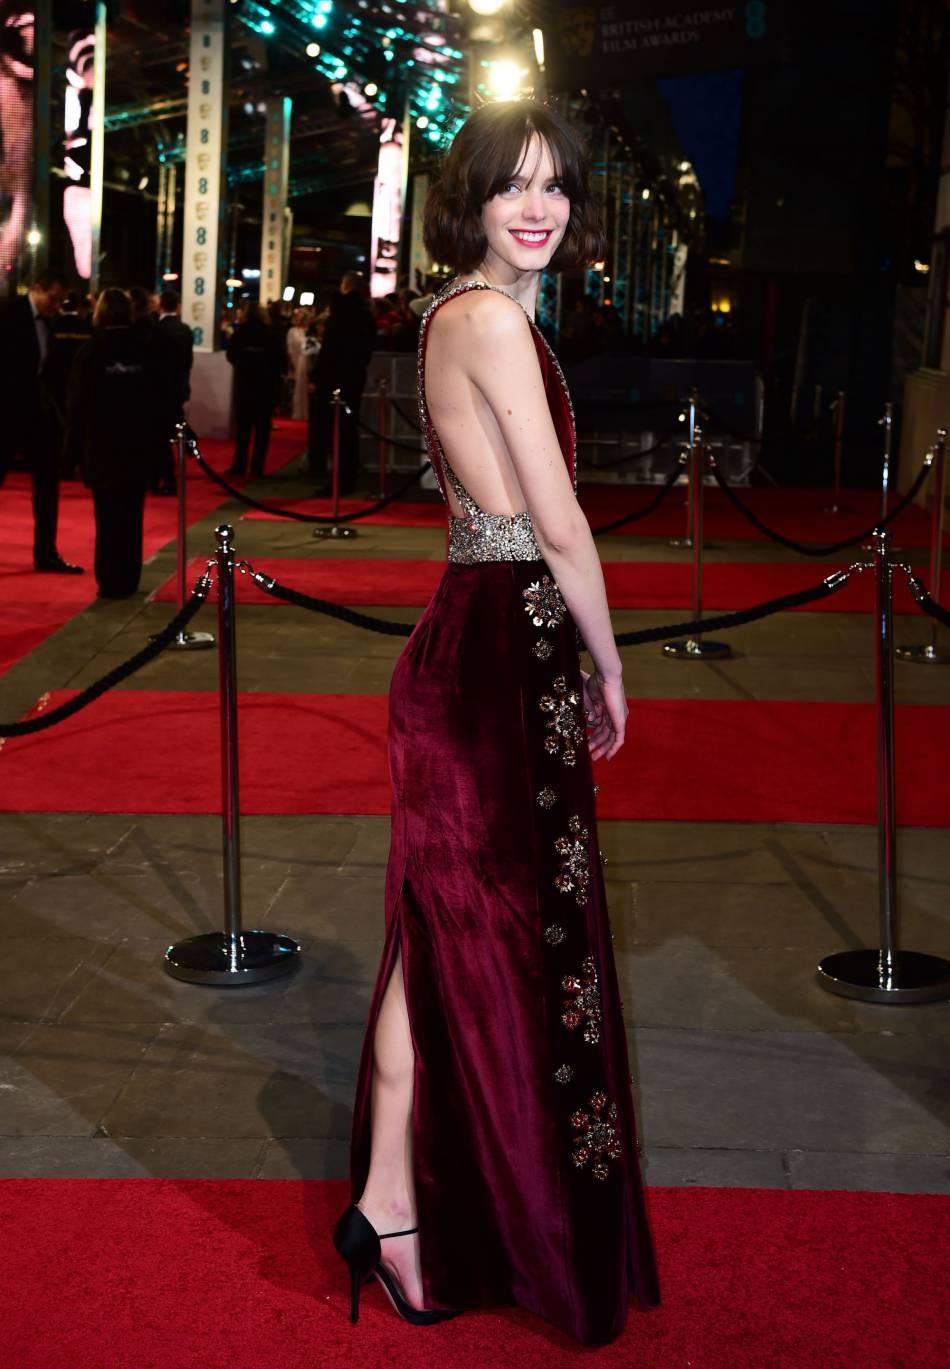 Stacy Martin aux BAFTA Awards, ce dimanche 14 février 2016.